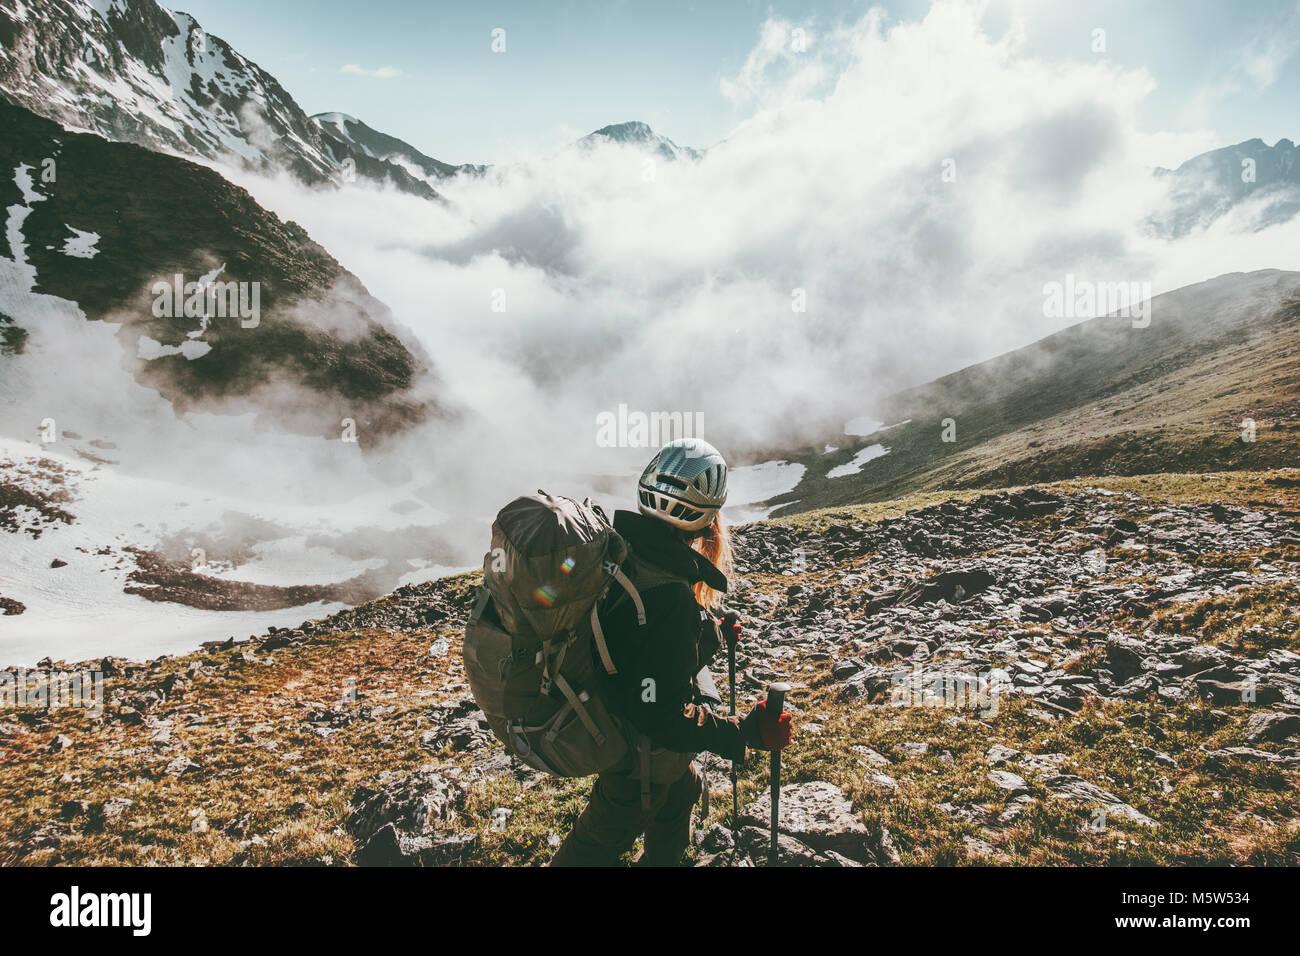 Frau wandern in nebligen Berge Reisen gesunder Lebensstil Abenteuer Konzept Aktiv Sommer Urlaub Outdoor Sport Mädchen Stockbild